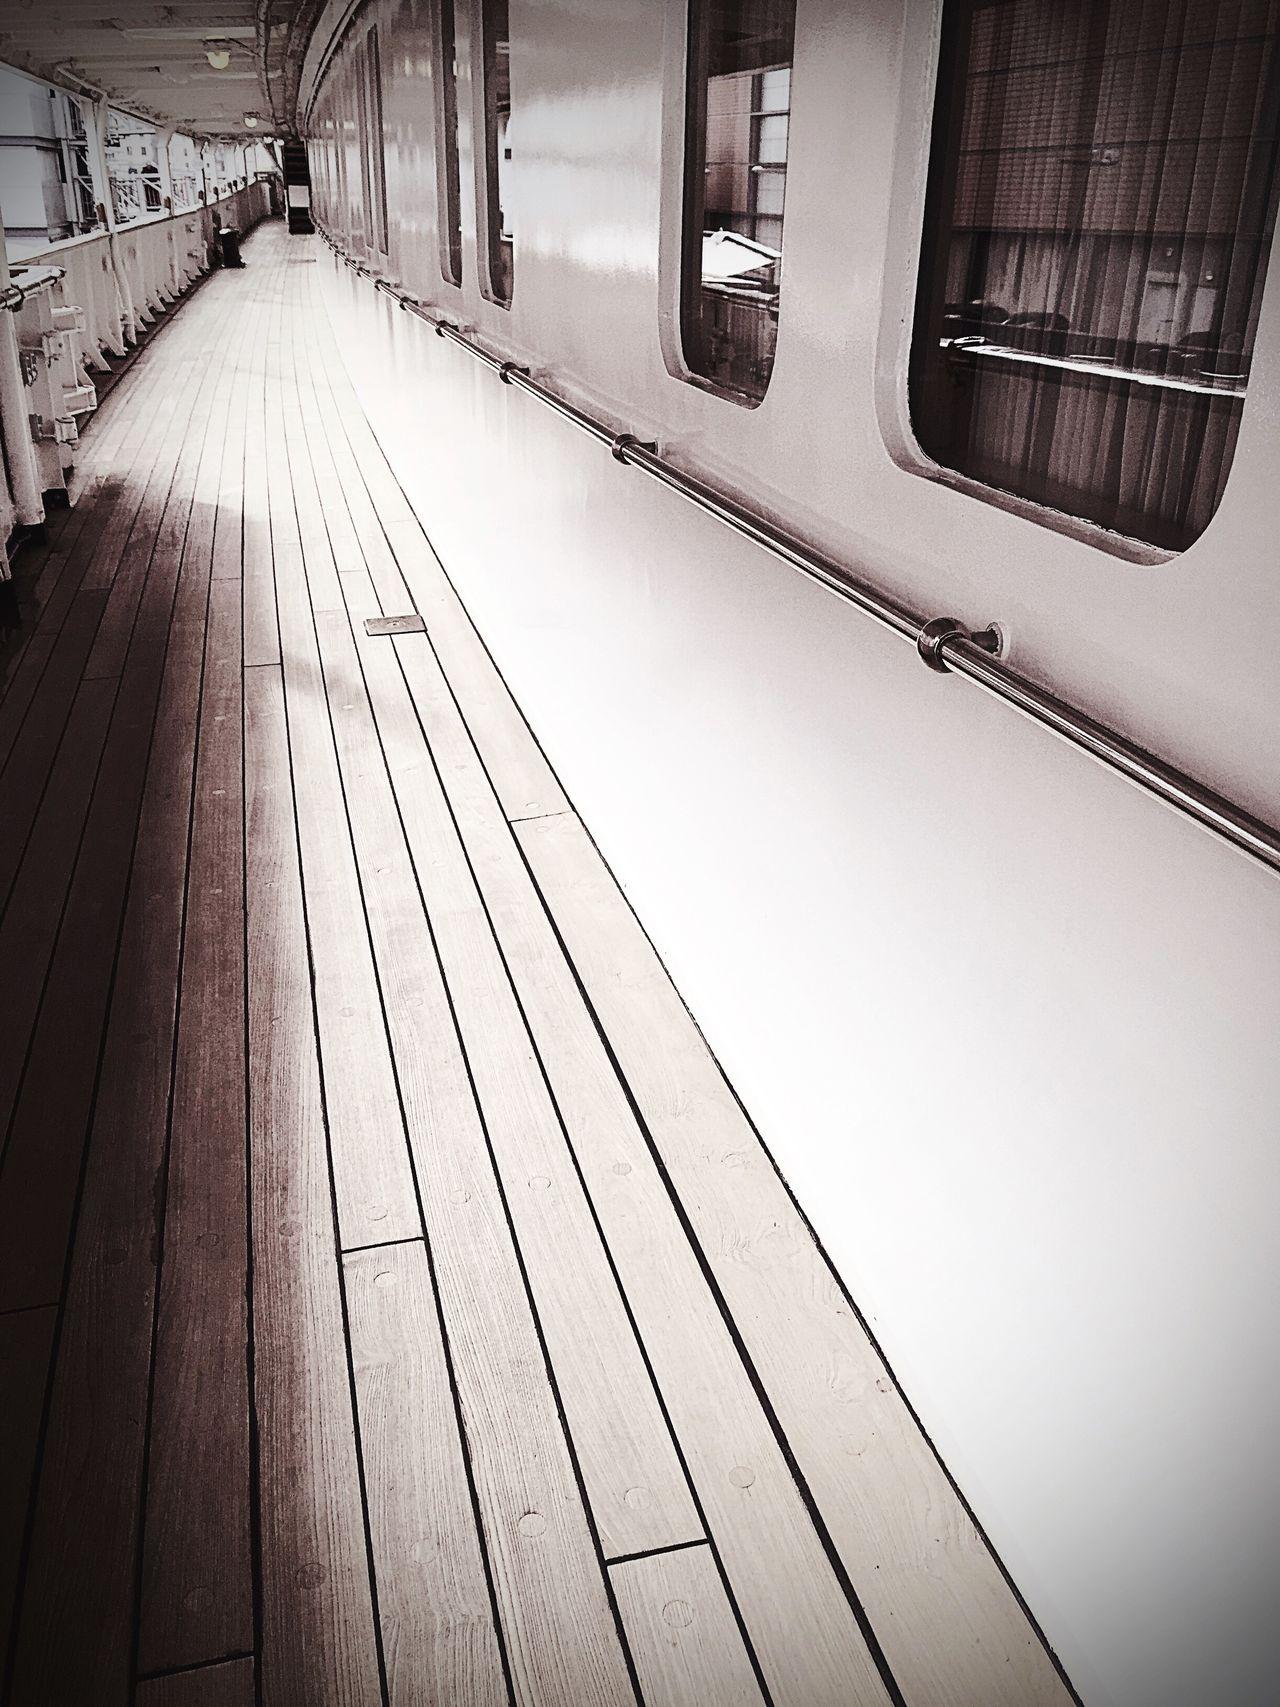 The Way Forward On Deck Onthedeck Deck Ships⚓️⛵️🚢 Ship Deck Ship Details Royal Yacht Britannia Ships Black & White Decks Deck Of Ship Deck Of Boat Shipdeck Yacht Life Boat Deck Boats⛵️ Shiplife Ships🚢 On Board On Boat Up On Deck Cabin Life